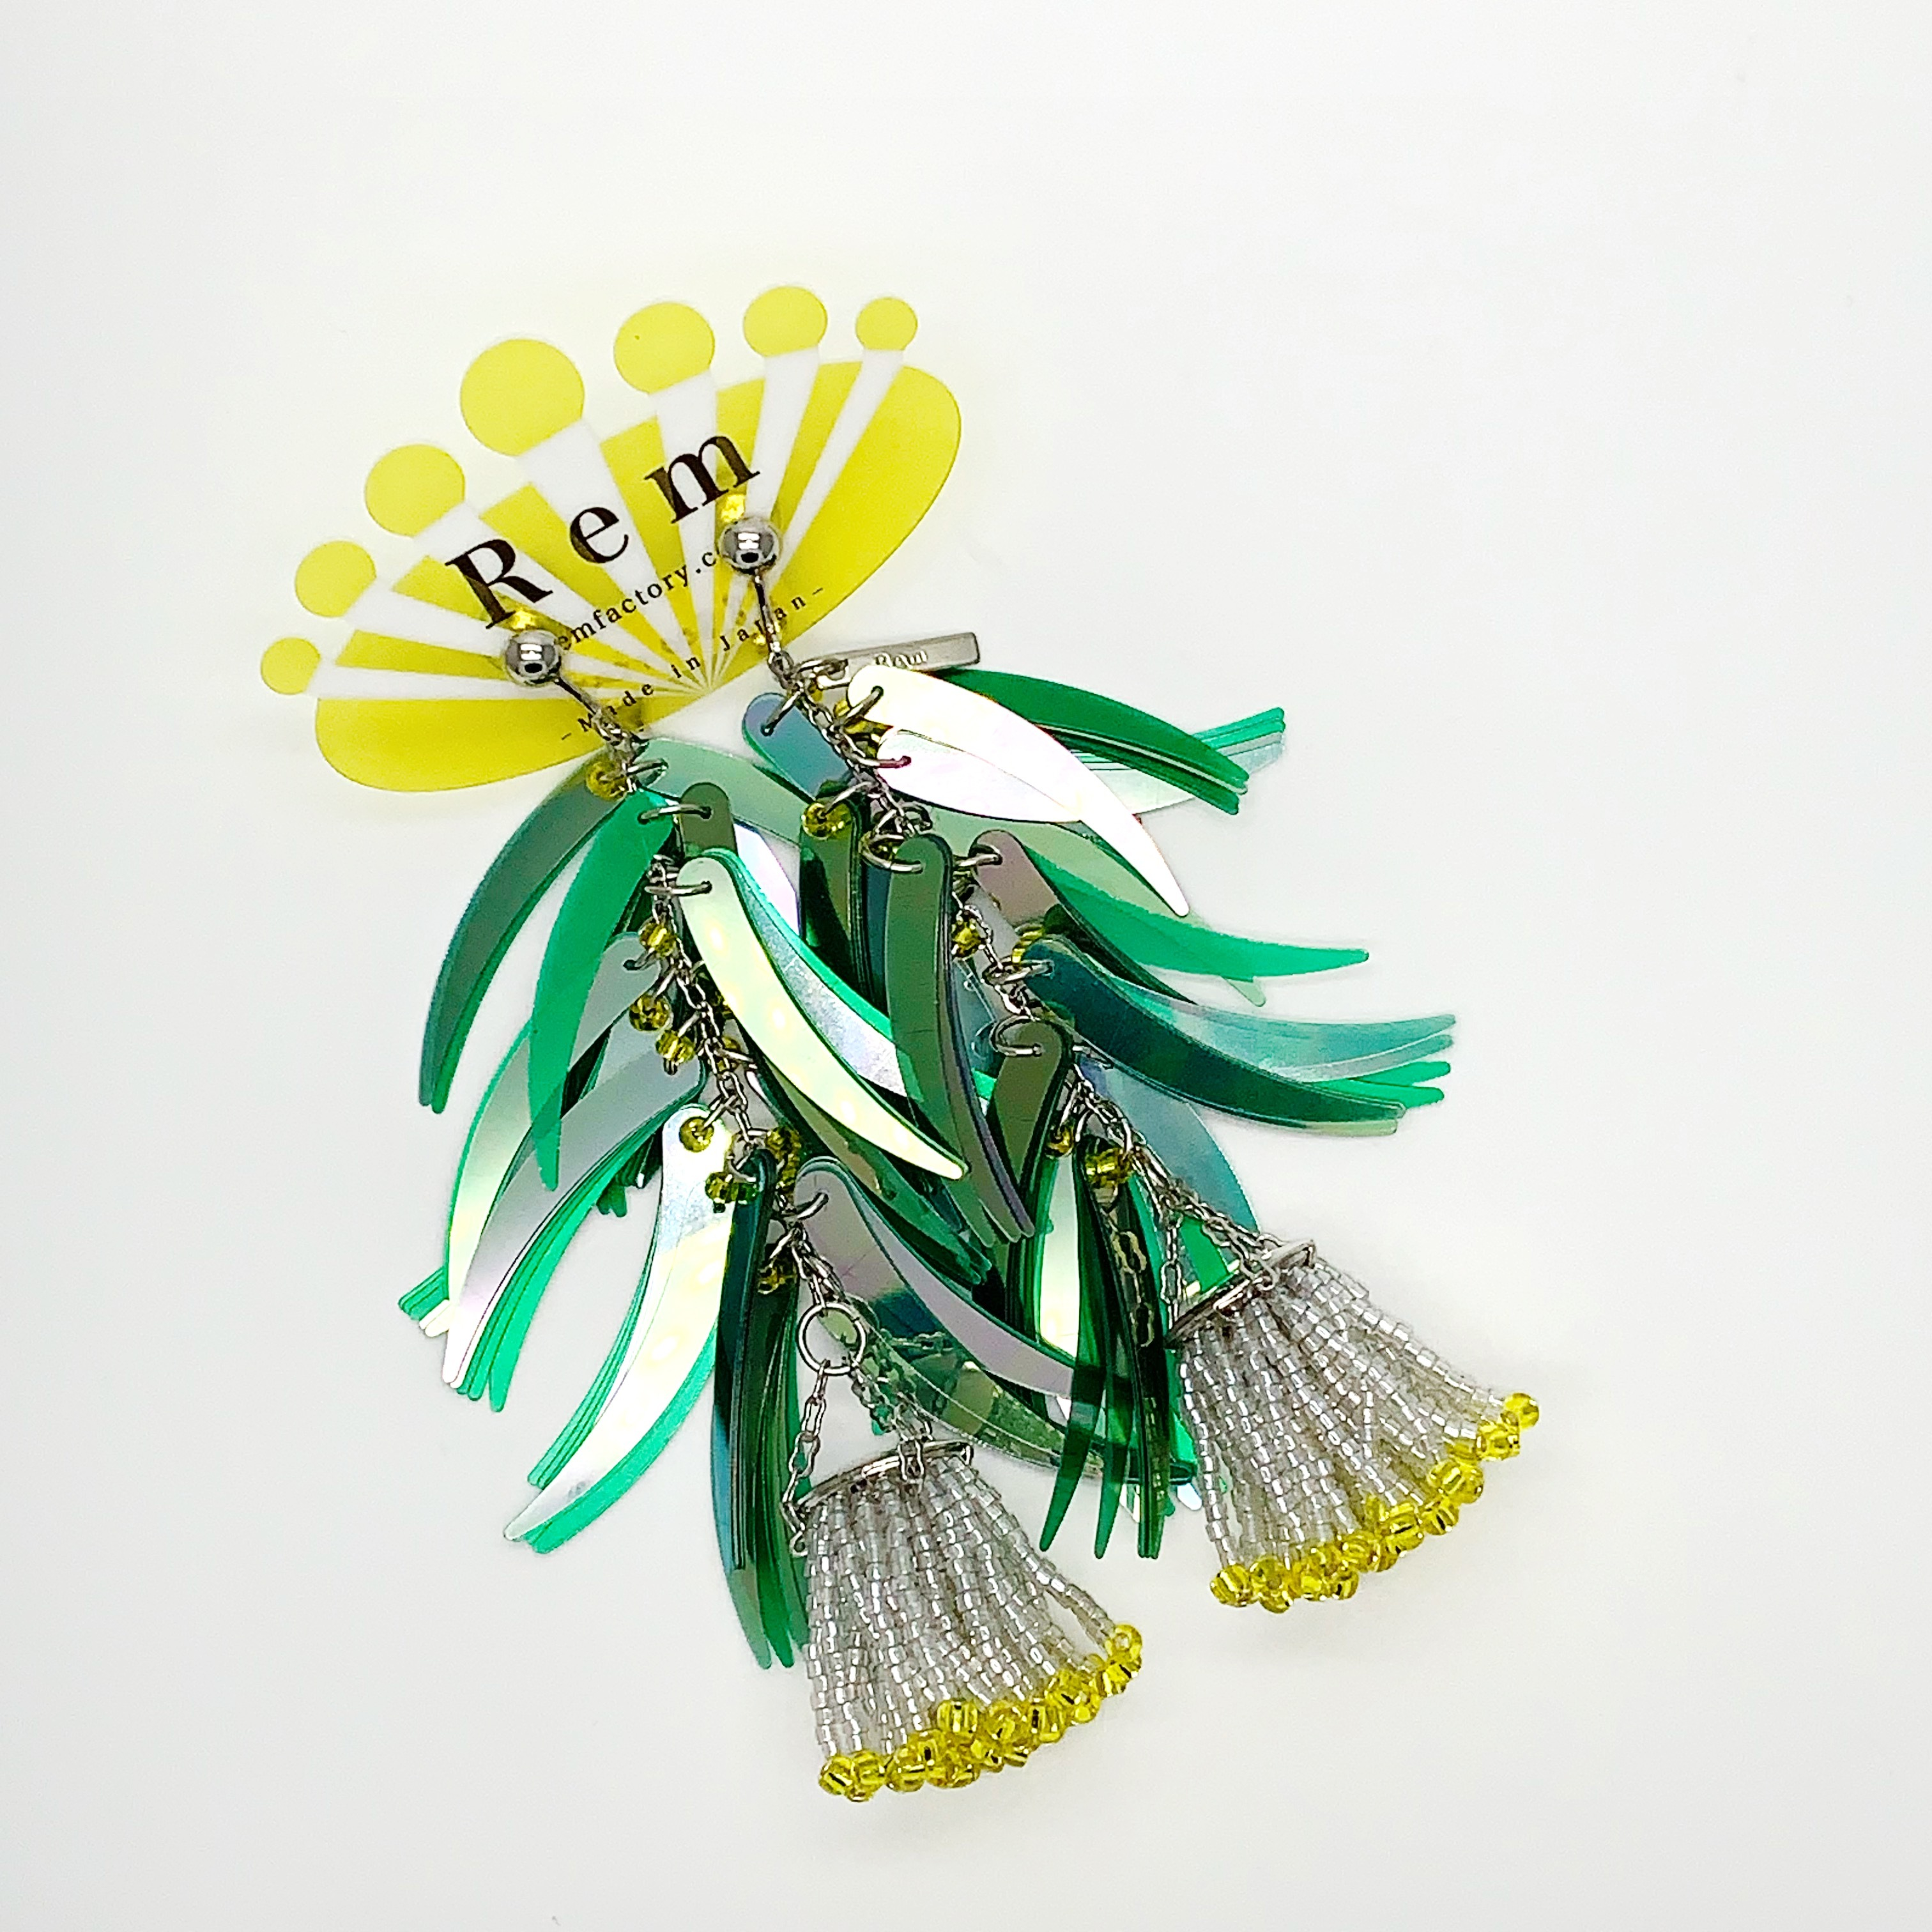 Rem つぼみ耳飾りグリーン イヤリング